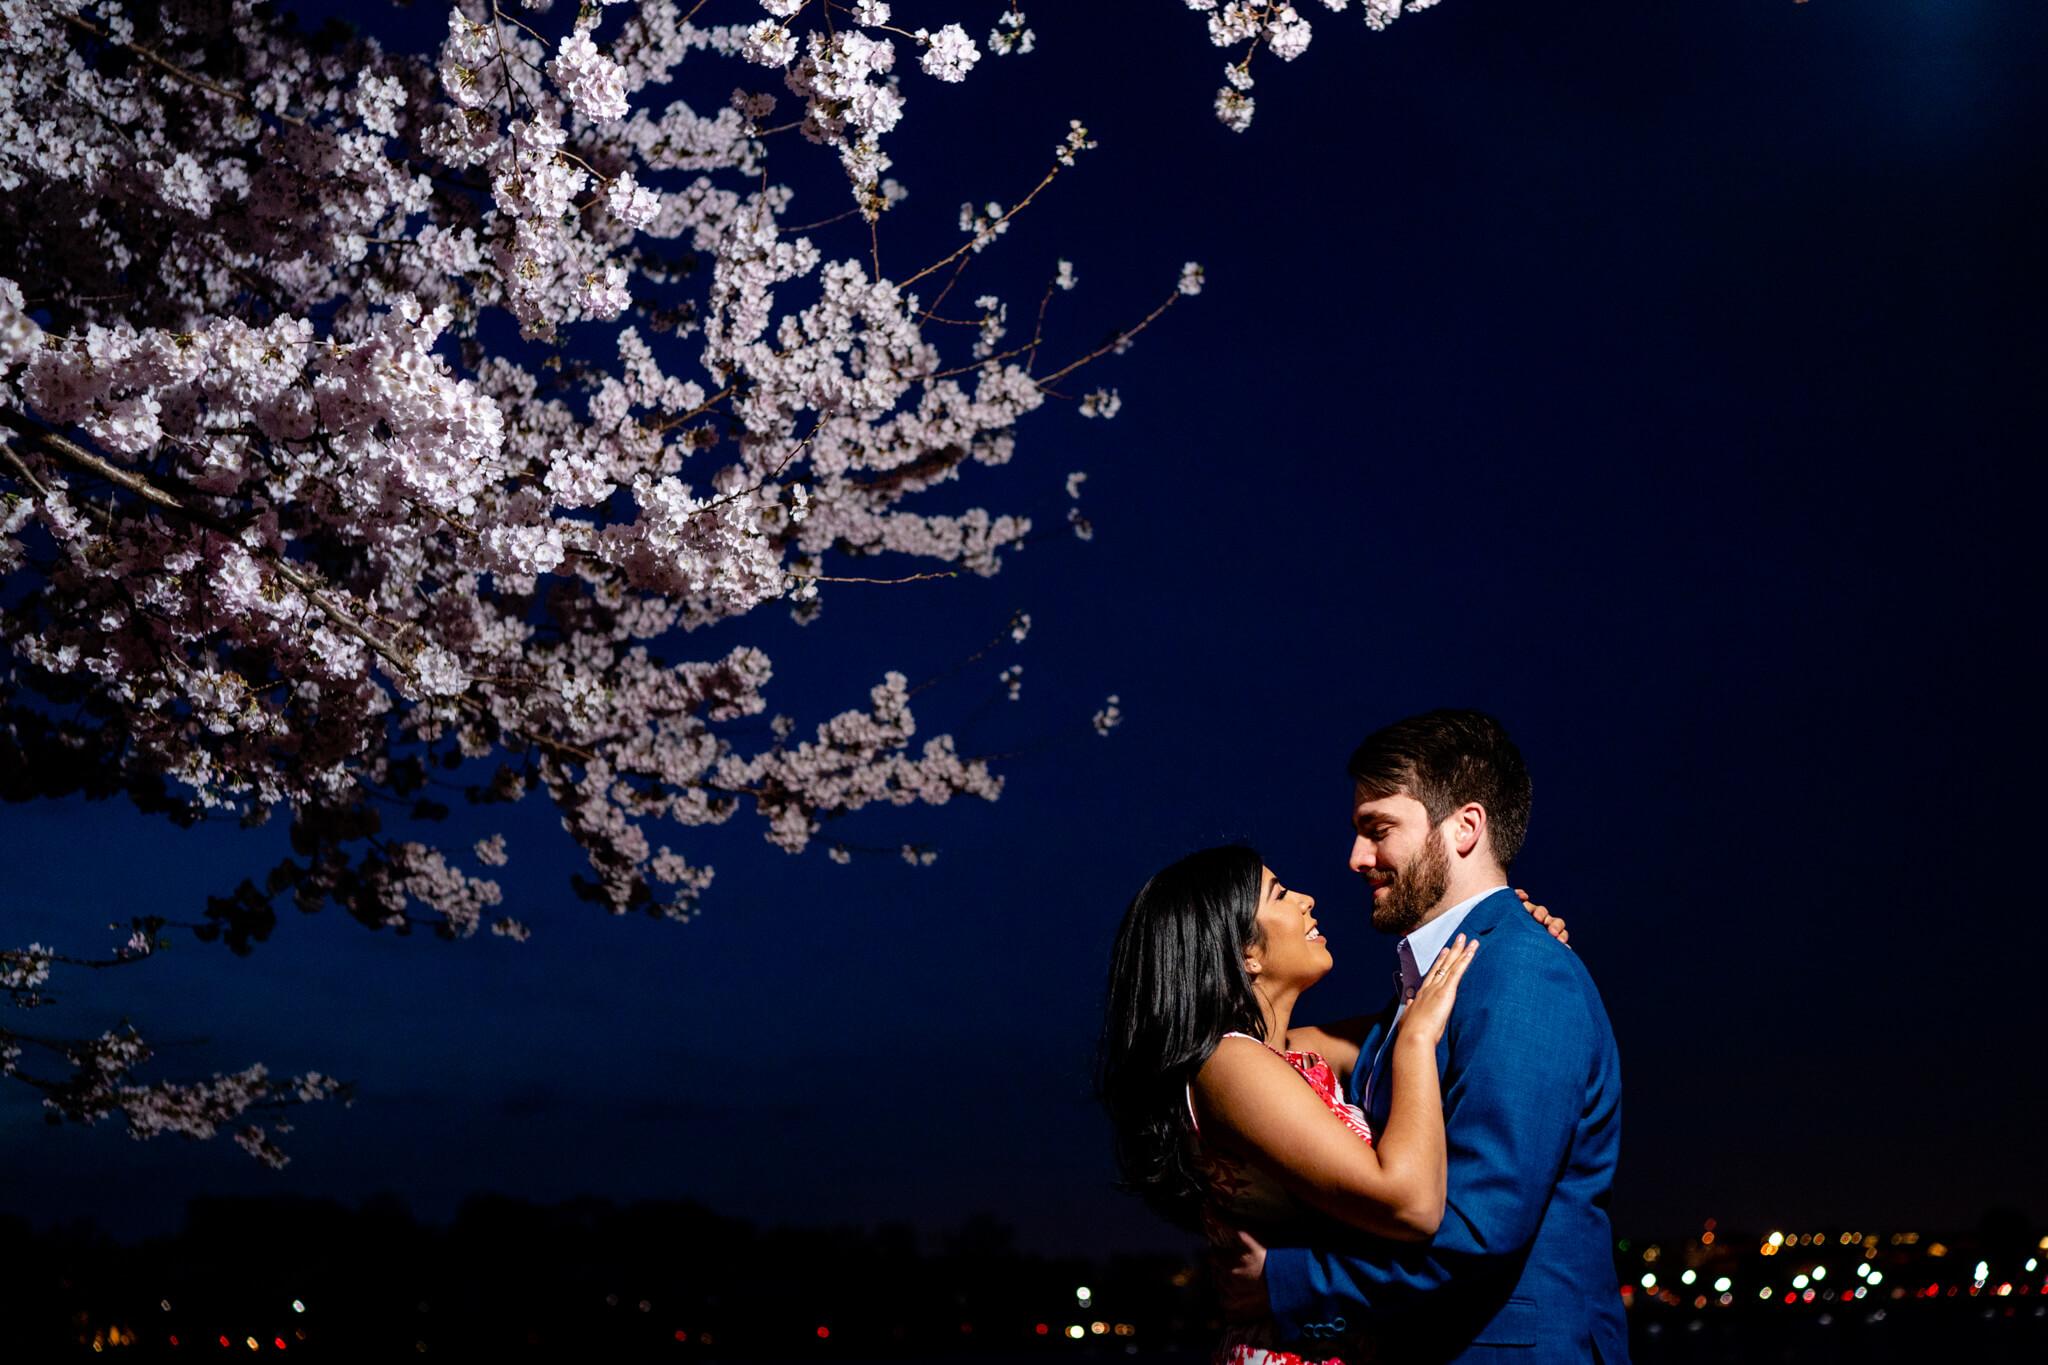 Danielle Michael DC Cherry Blossom Engagement Tidal Basin Washington Monument Engaged NYE Wedding Inspiration-5.jpg